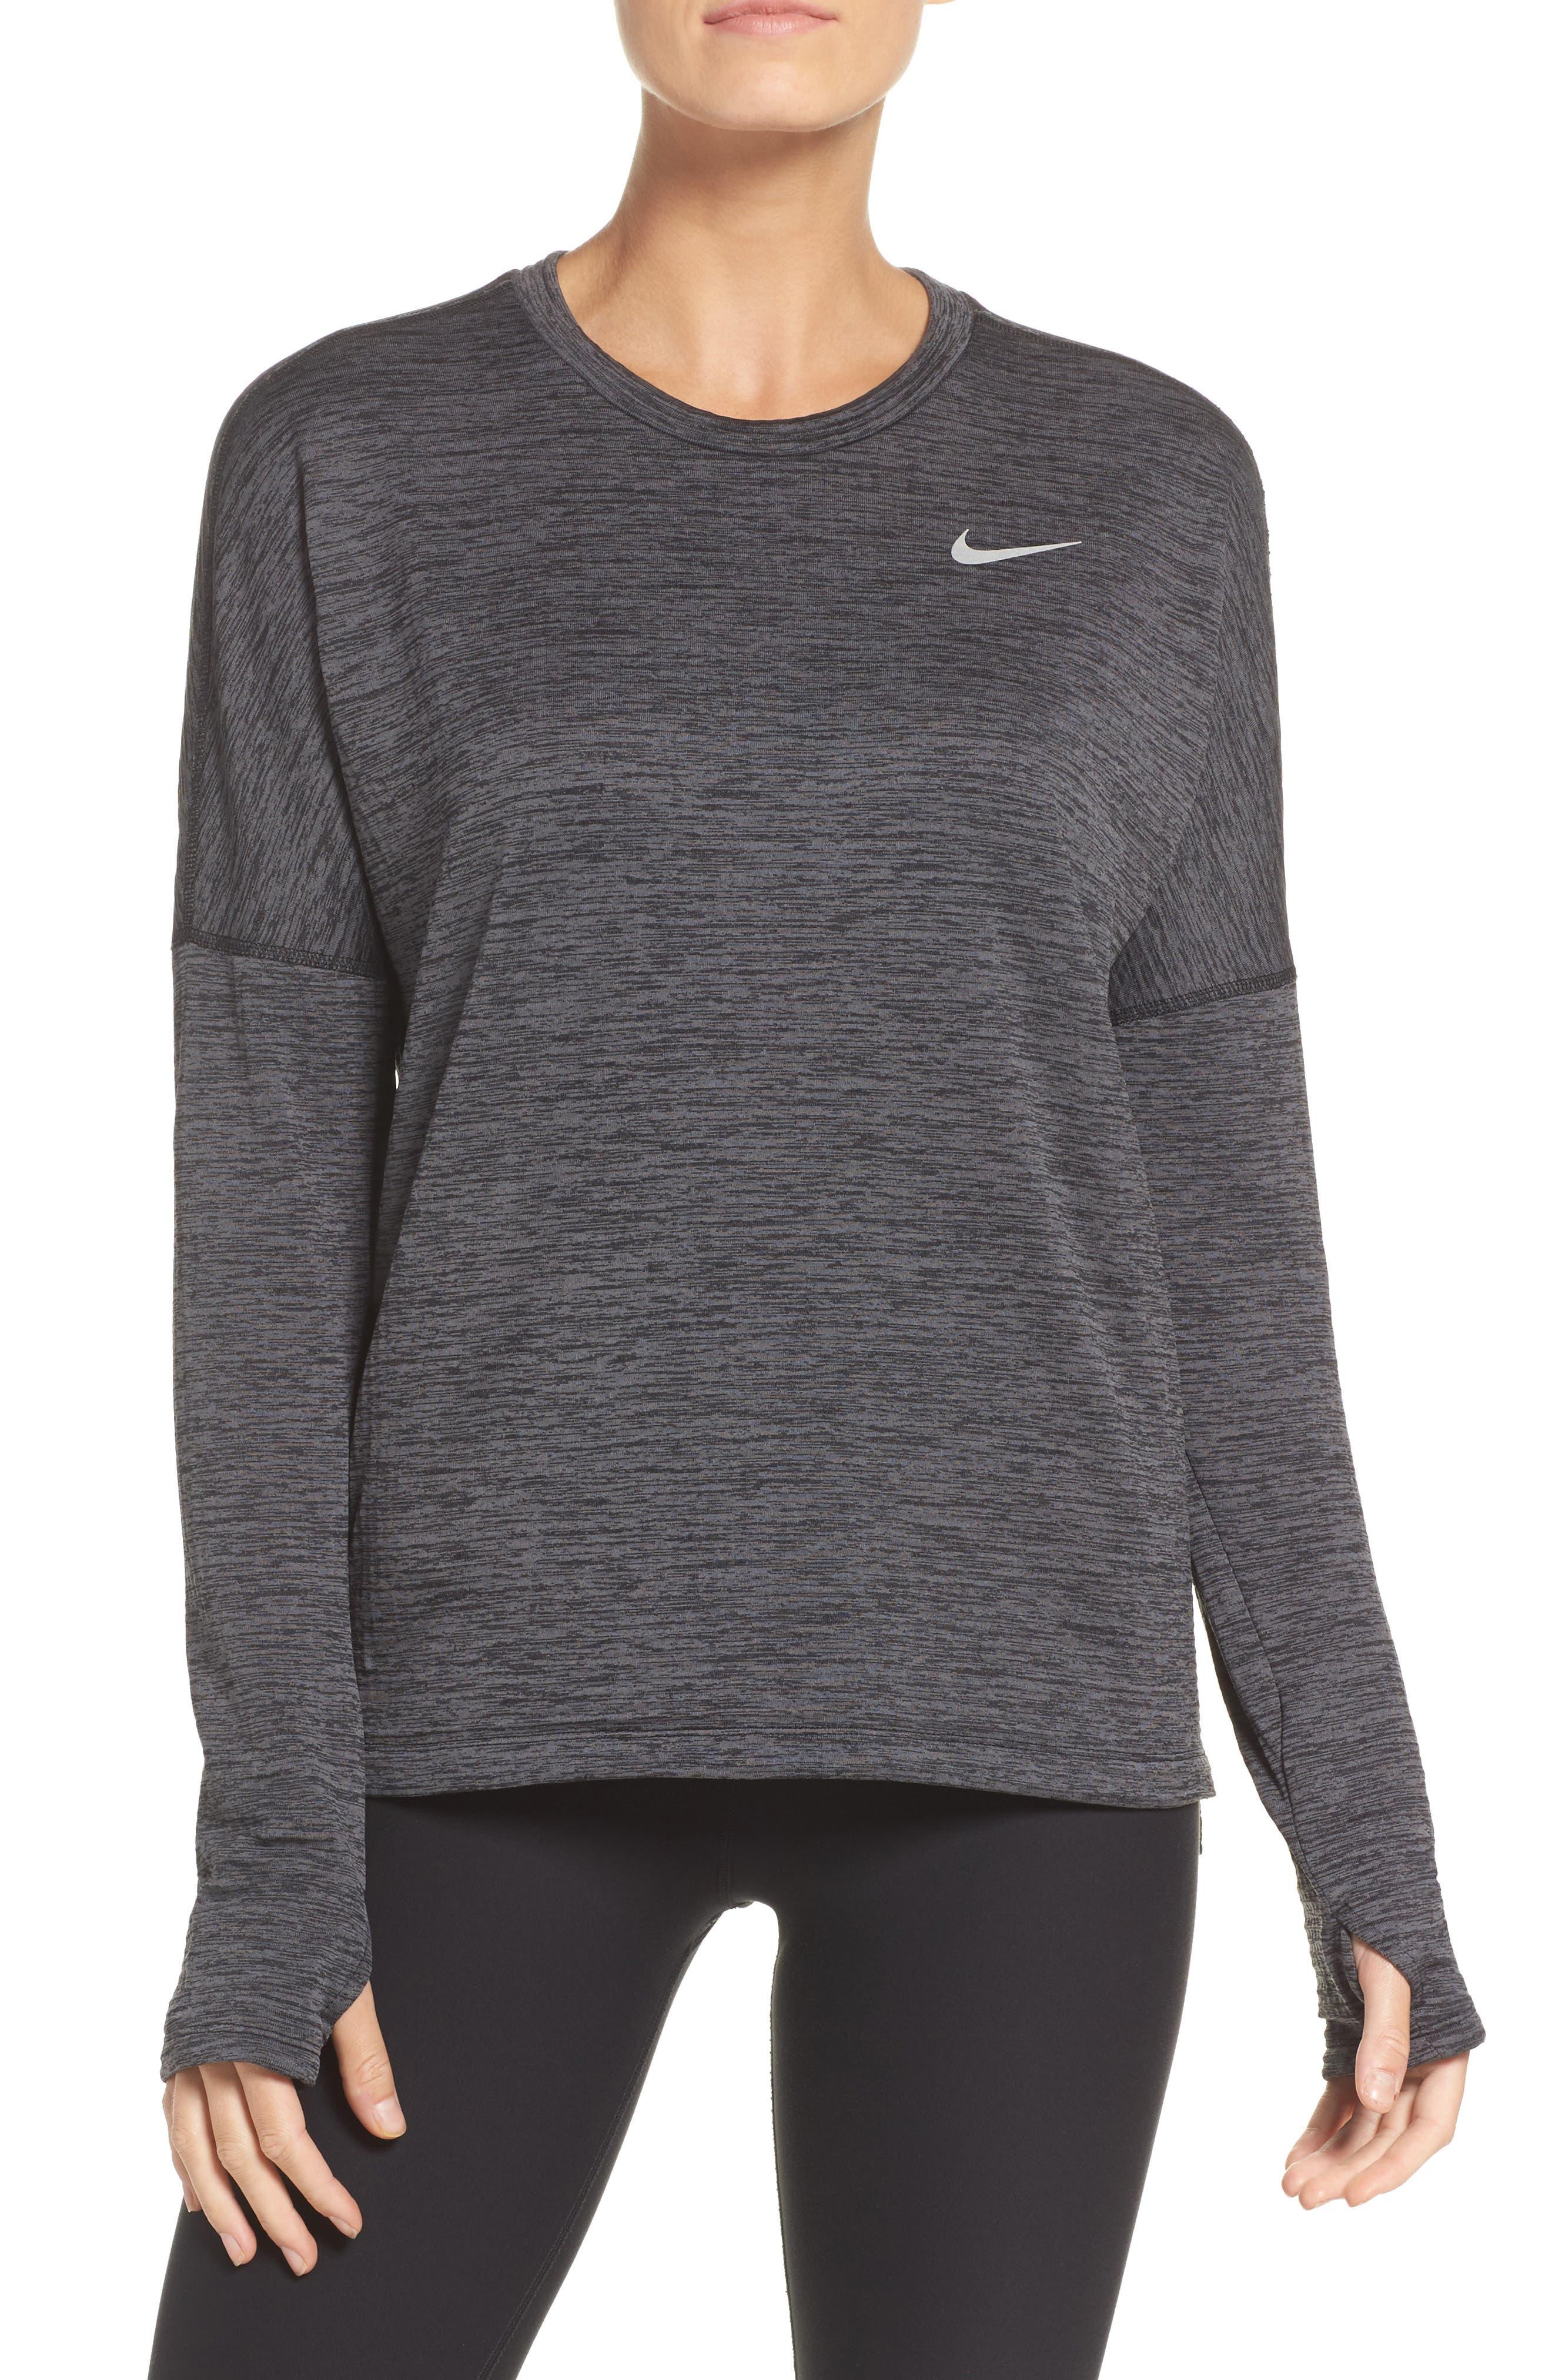 Alternate Image 1 Selected - Nike Therma Sphere Element Running Top